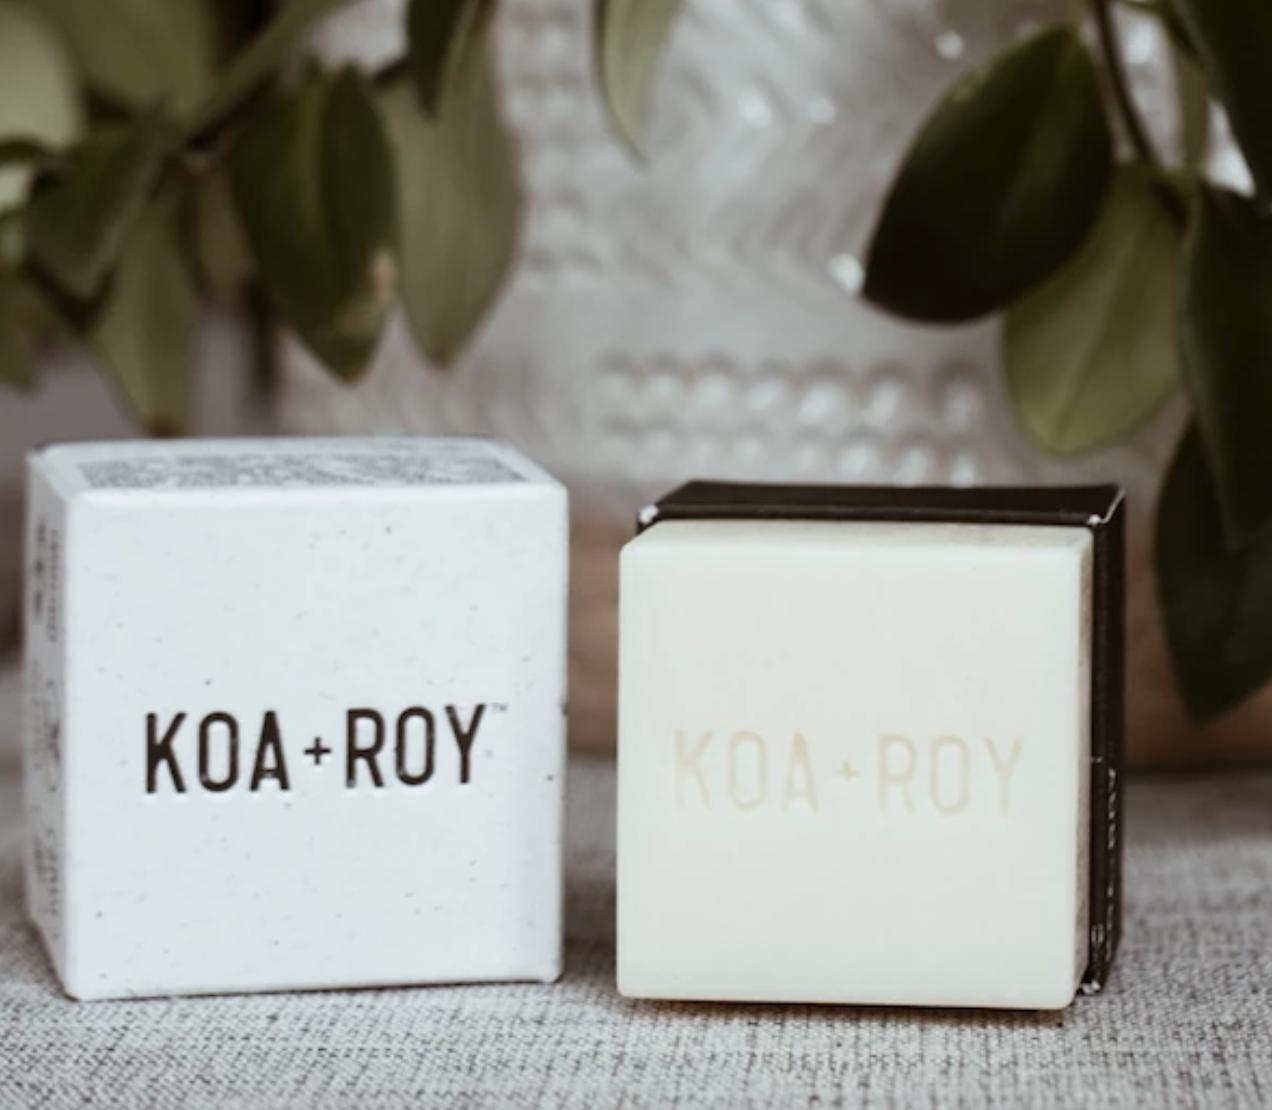 Koa+Roy Cube